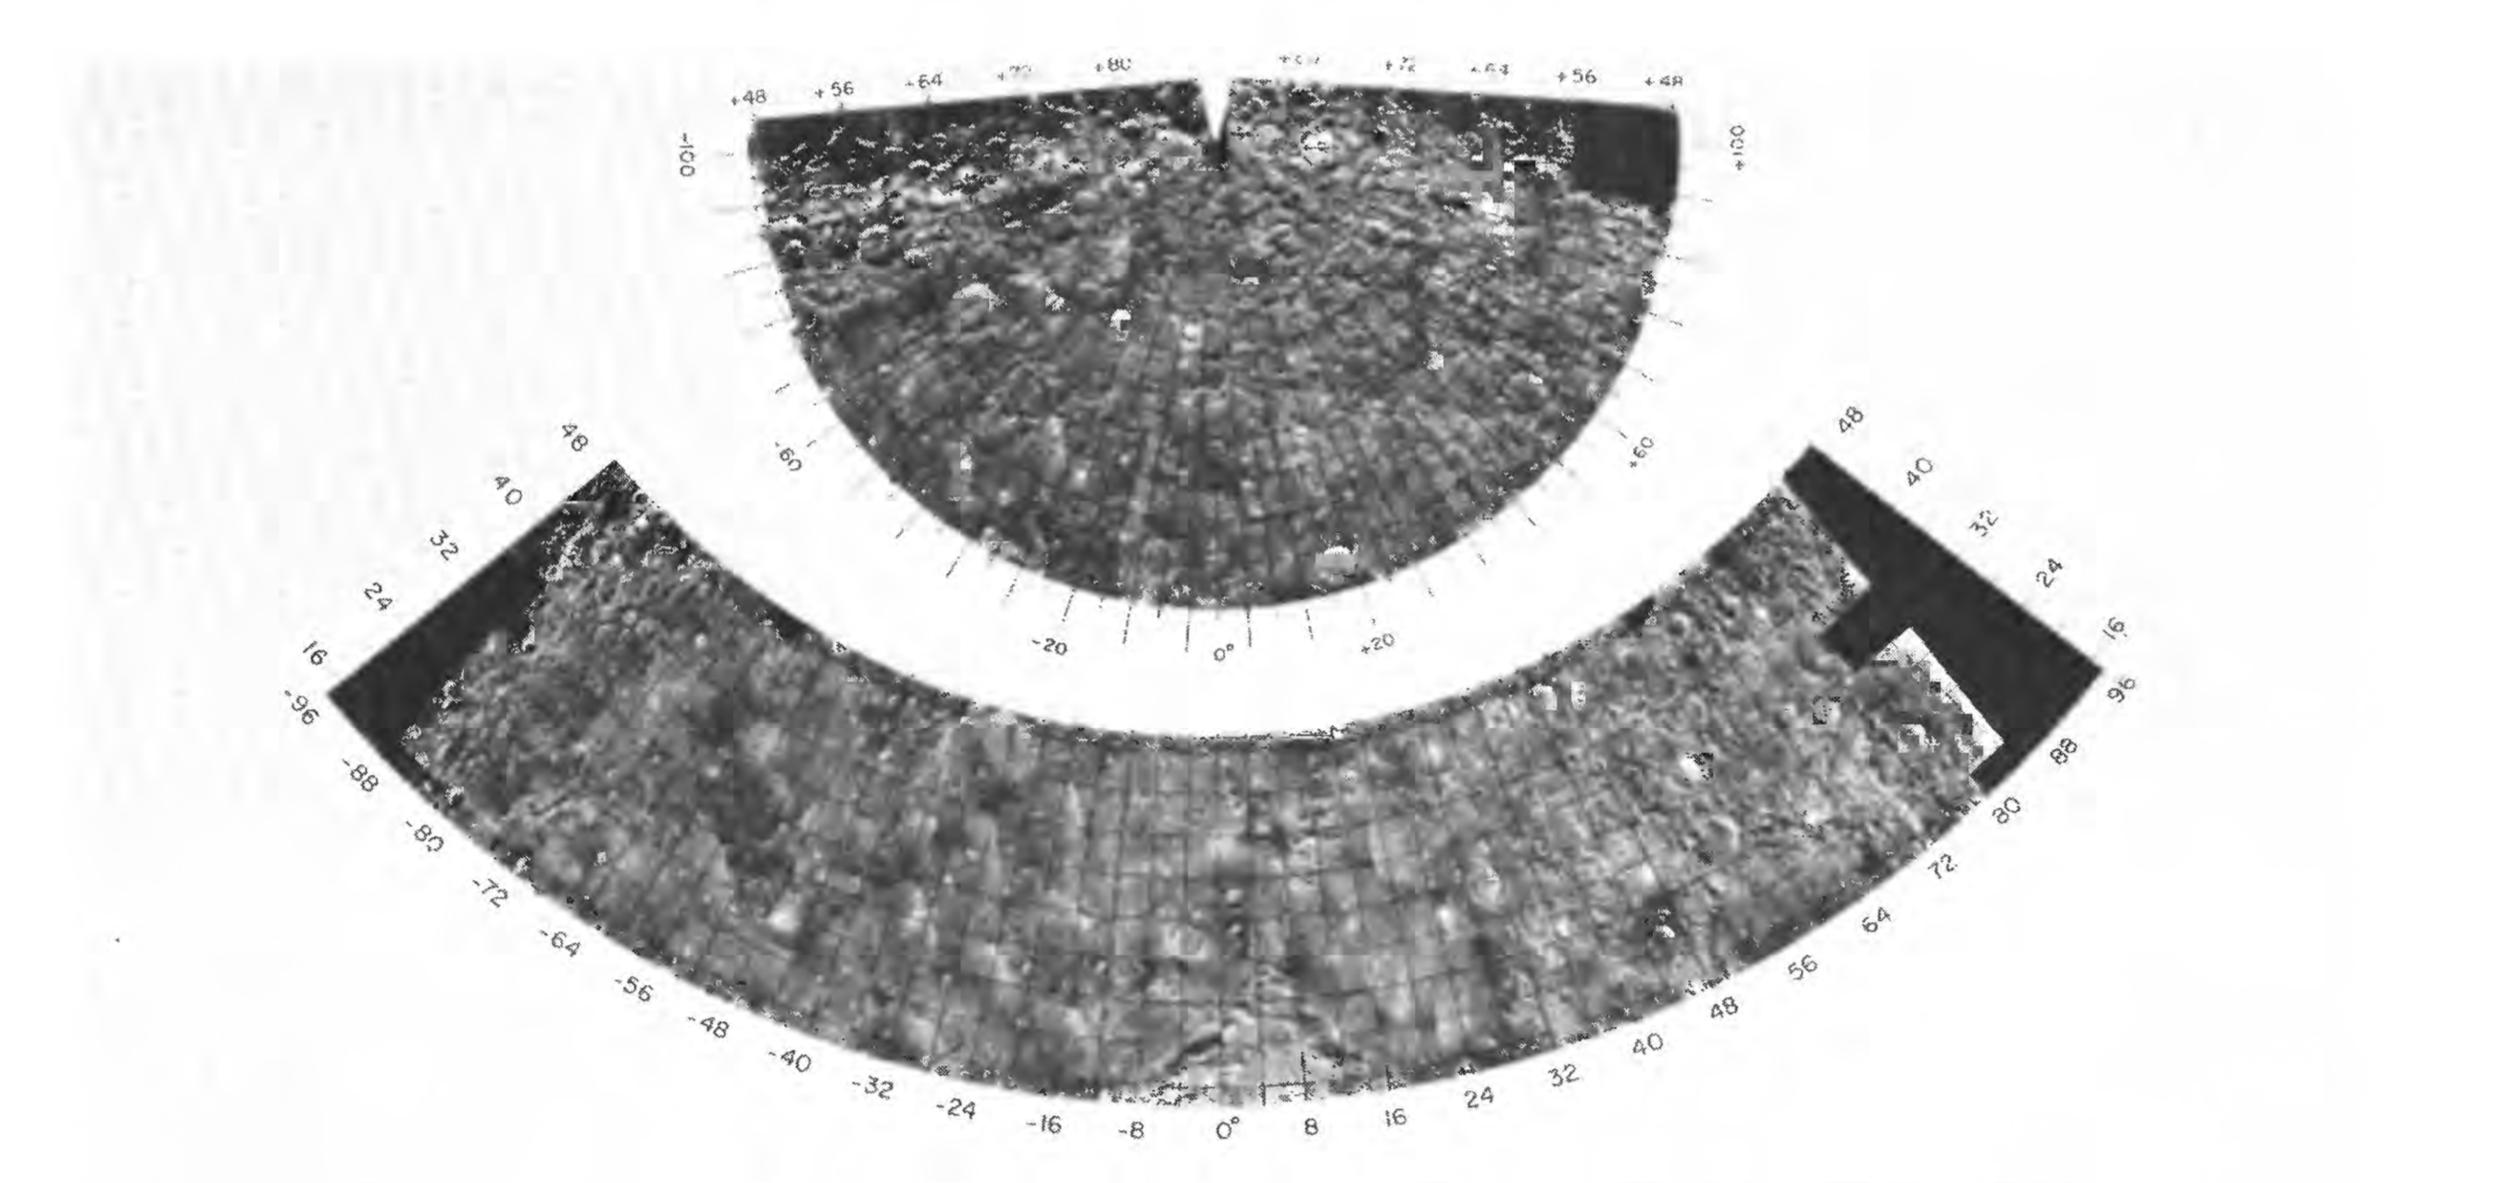 Moon Radar Image 4.png